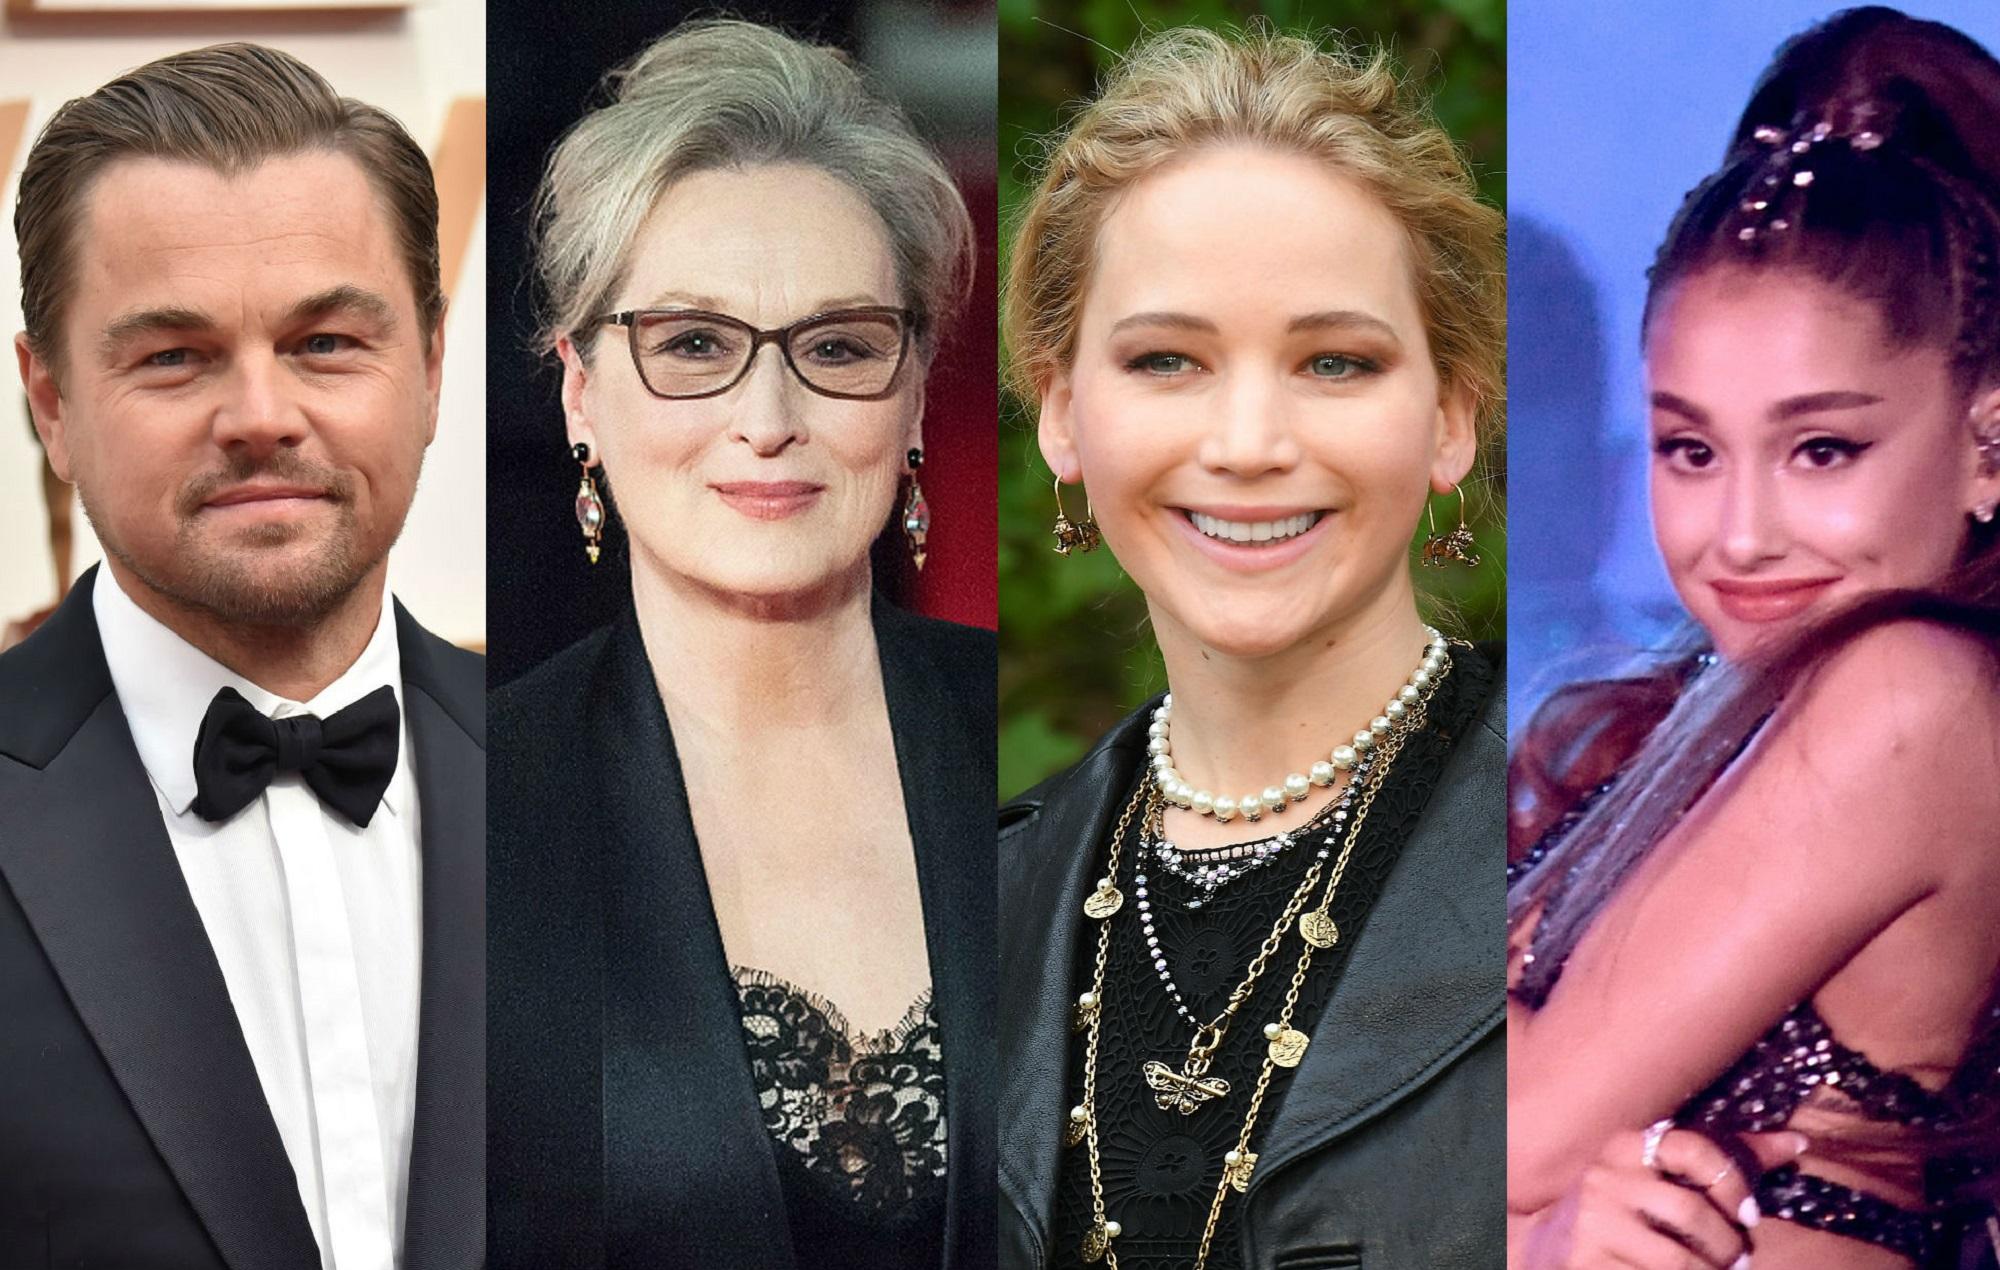 Leonardo DiCaprio, Meryl Streep, Jennifer Lawrence and Ariana Grande